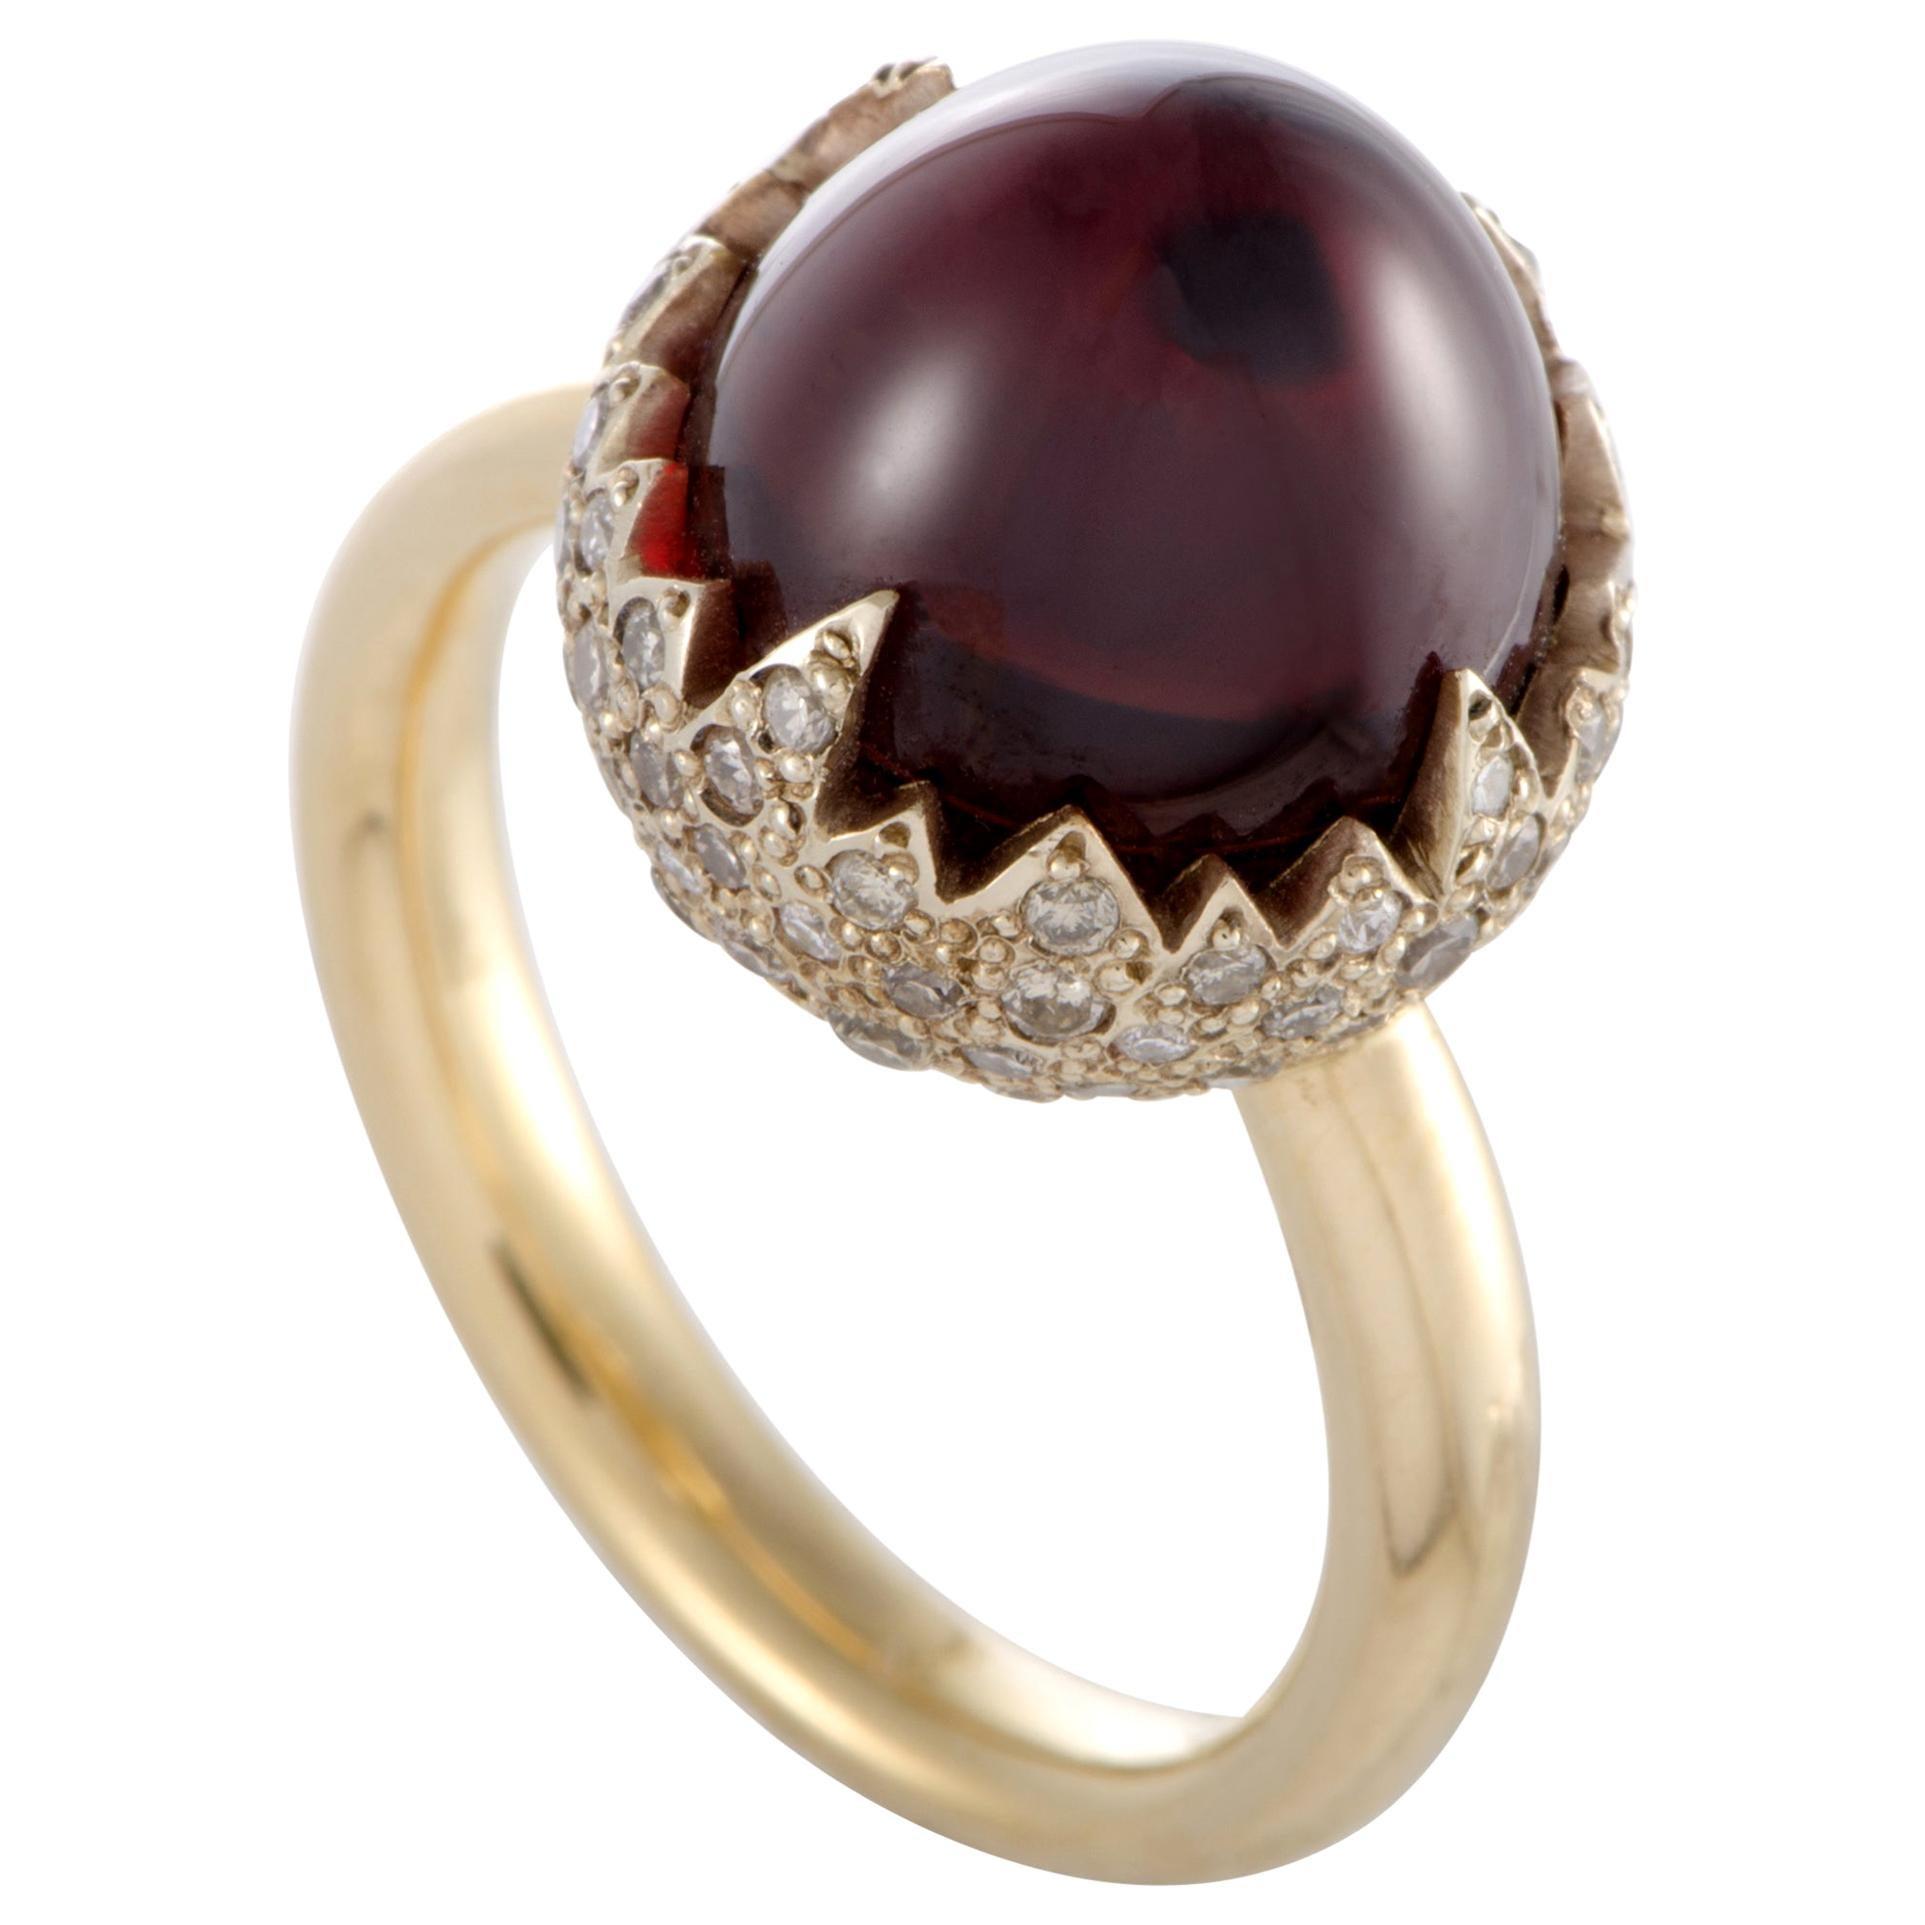 Pomellato Chimera 18 Karat Yellow Gold Diamond and Garnet Cabochon Ring